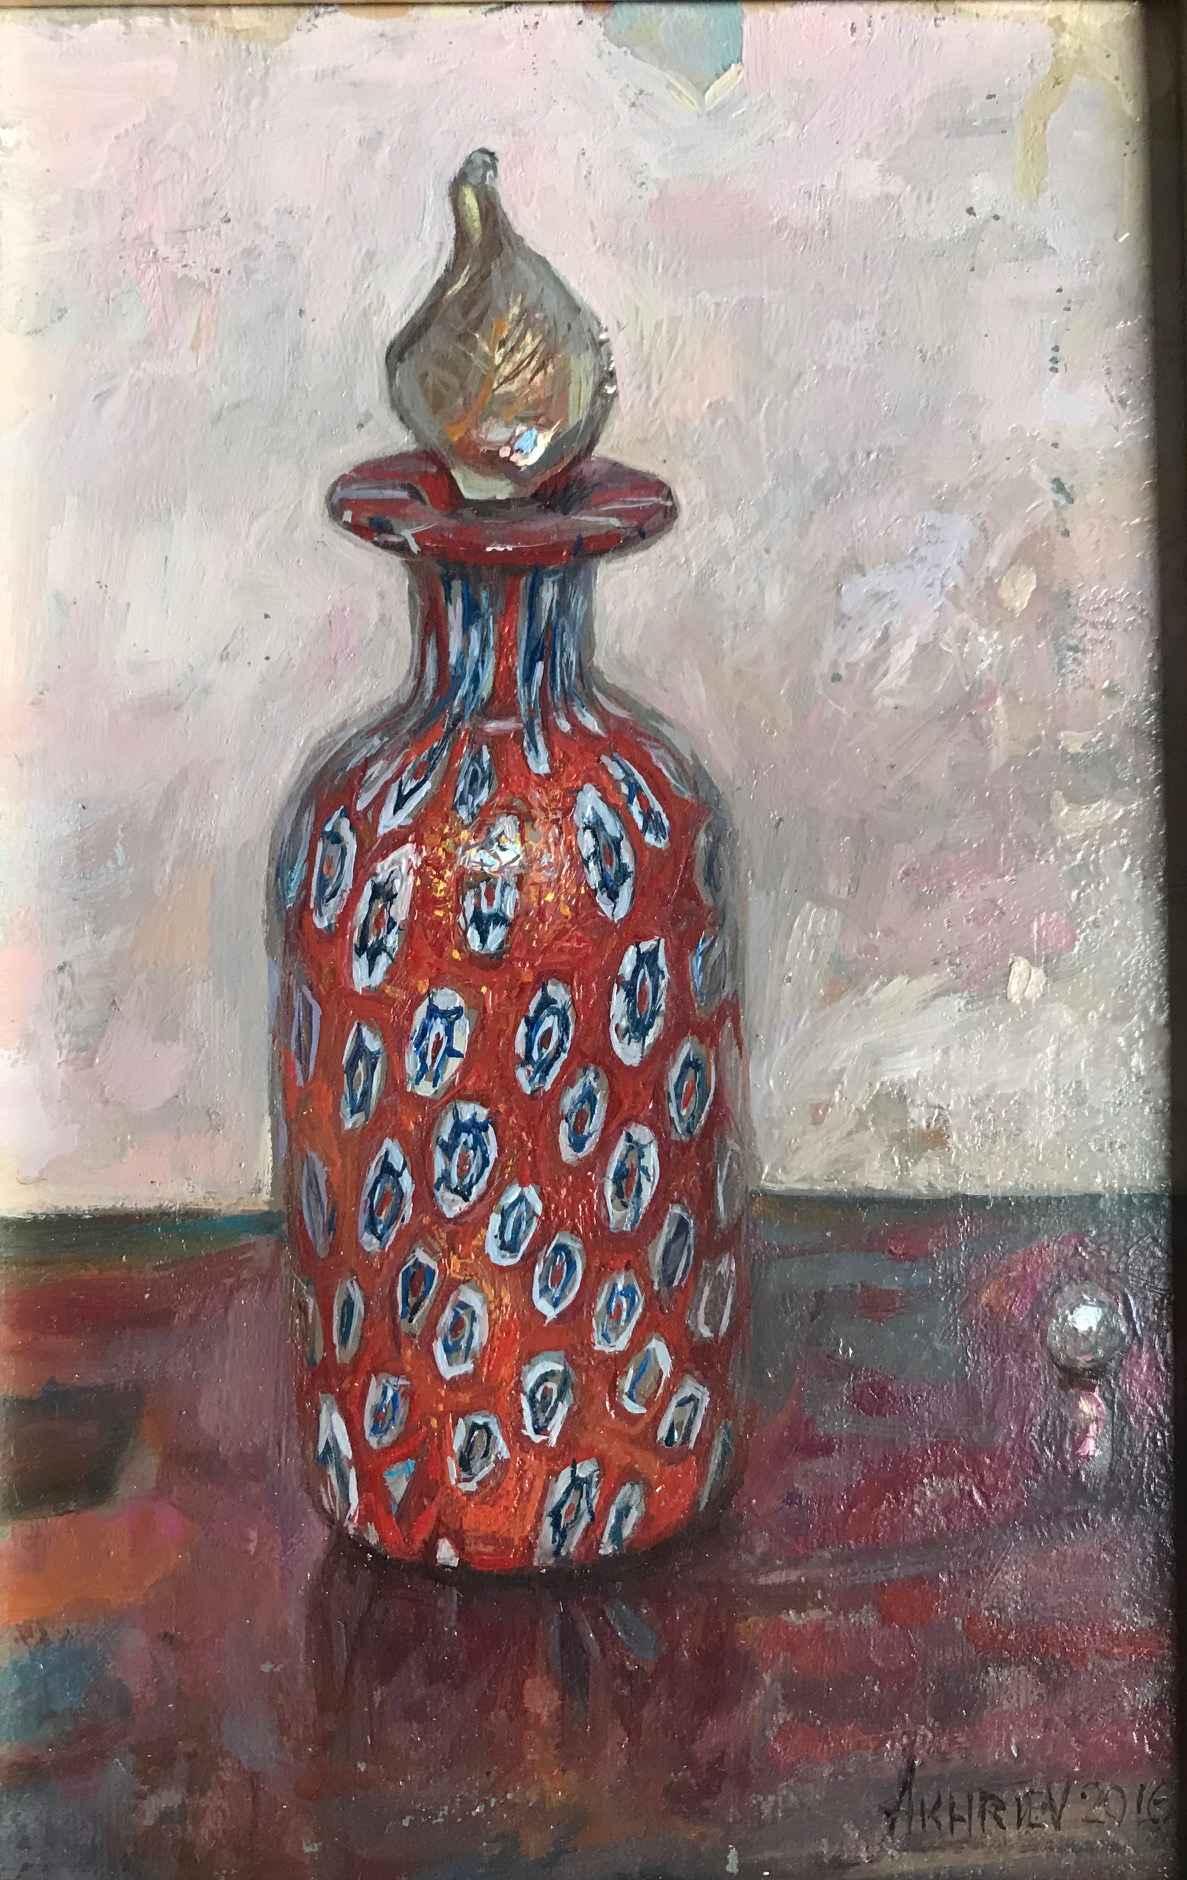 In a Relationship, II by  Daud Akhriev - Masterpiece Online